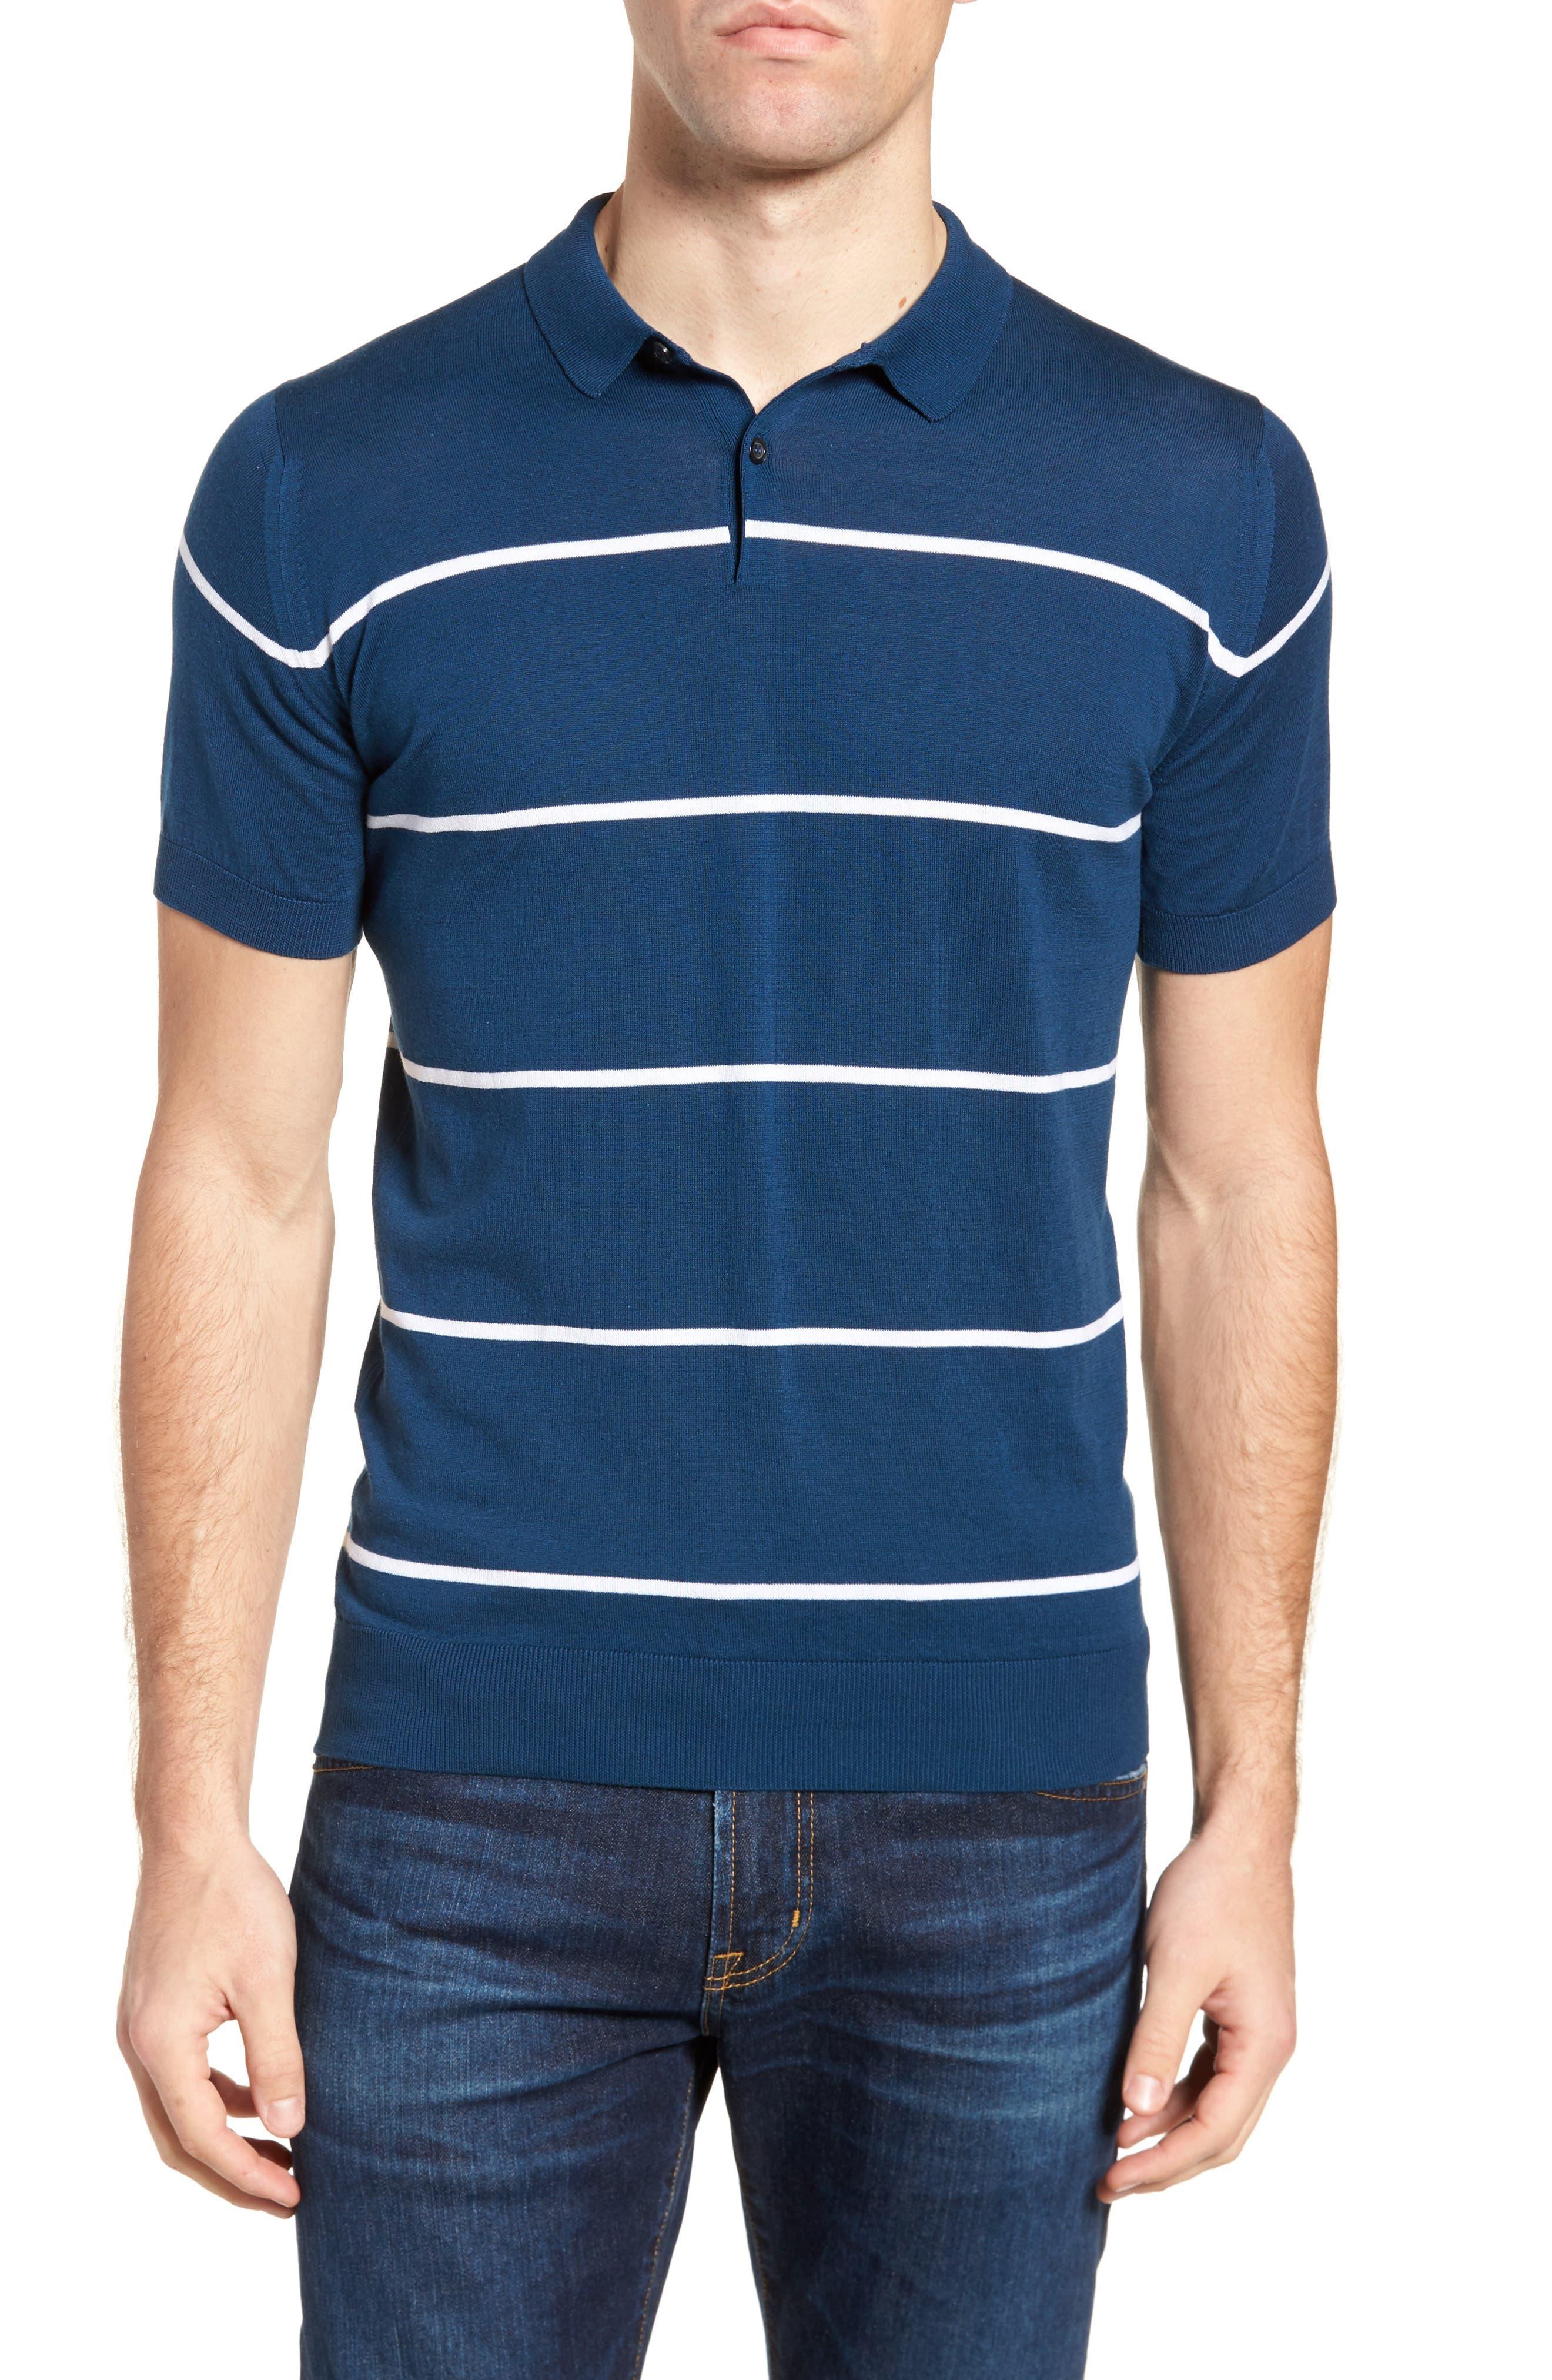 Alternate Image 1 Selected - John Smedley Stripe Jersey Polo